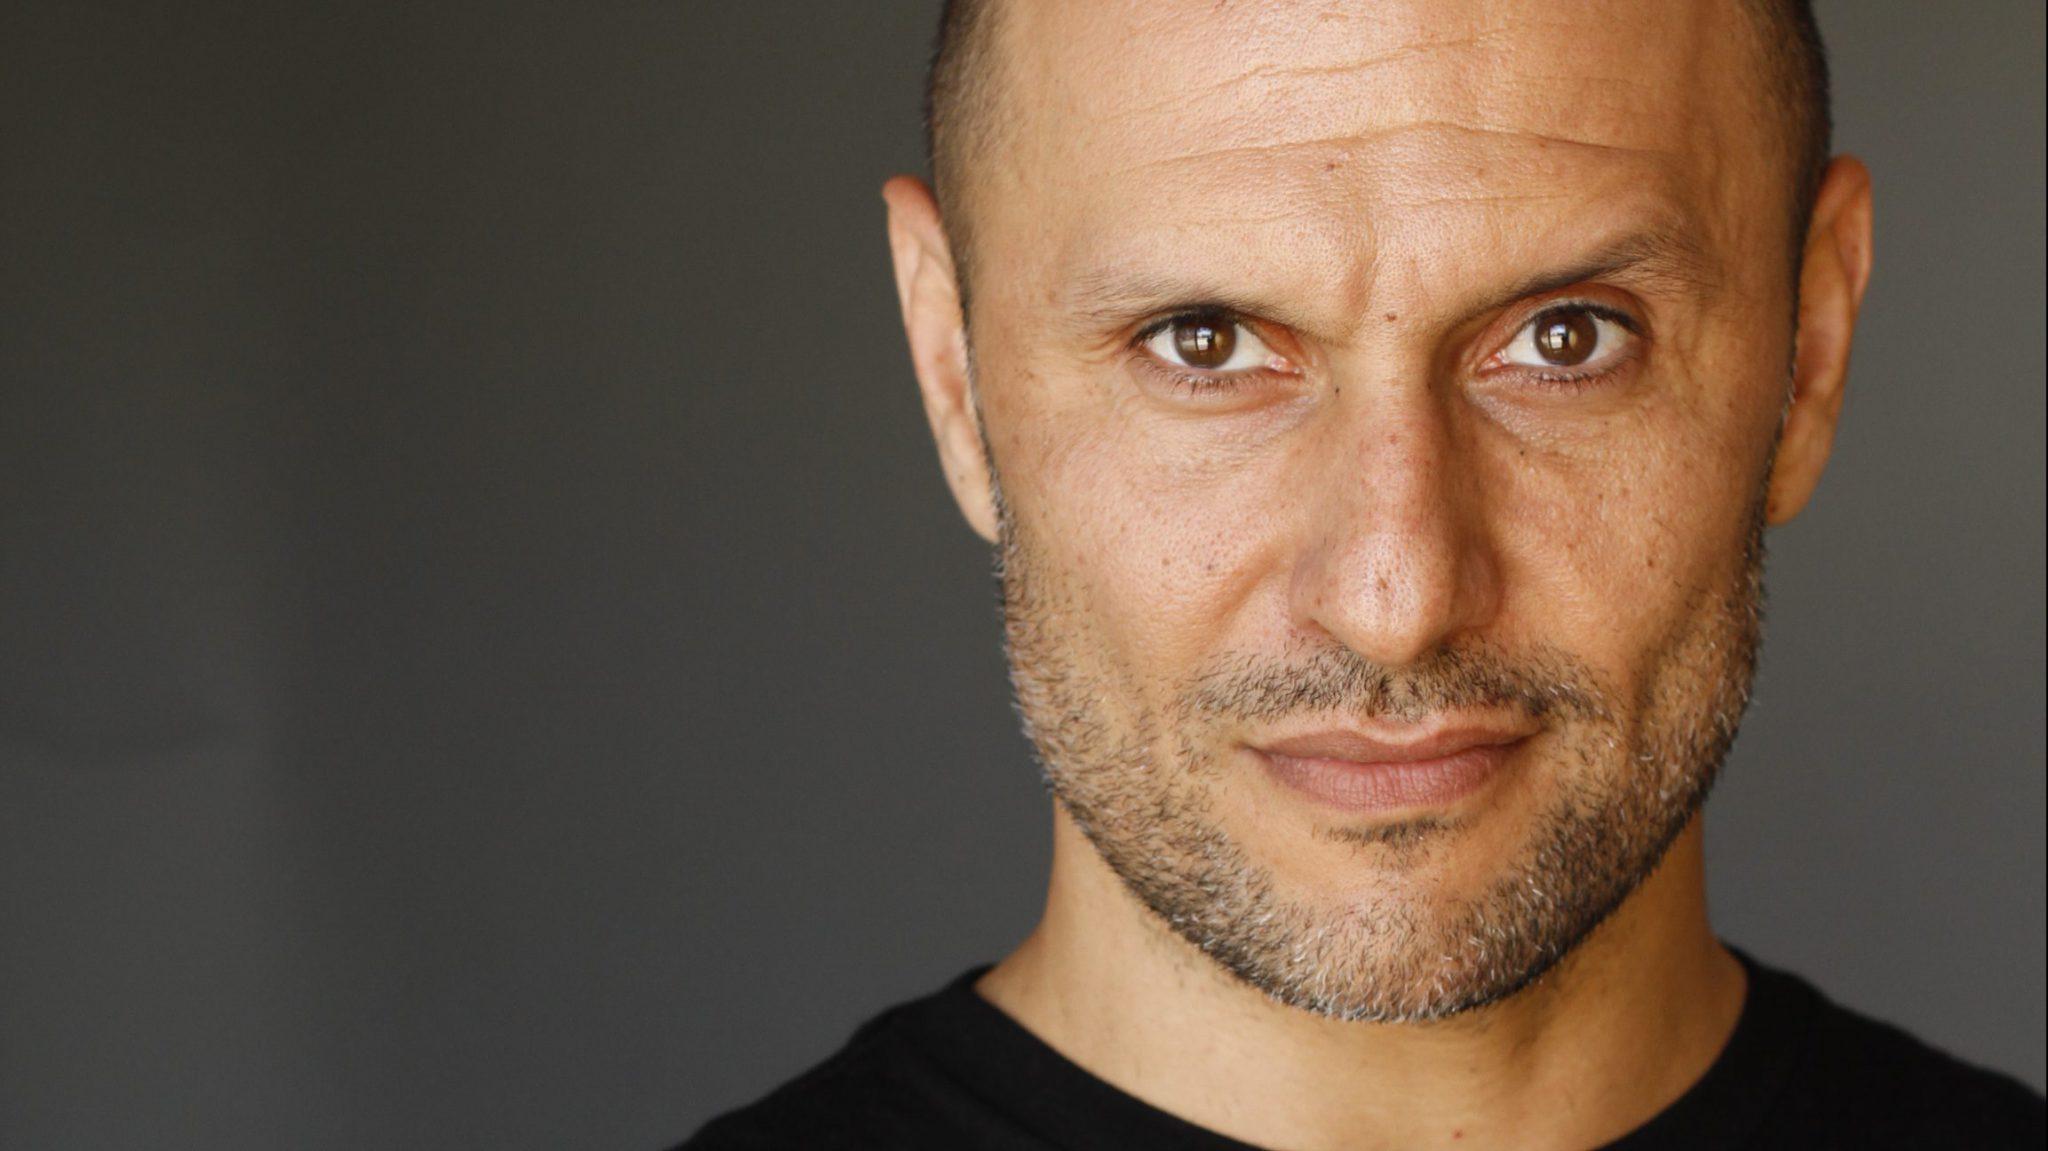 Personal Coaching by Amir Khalighi